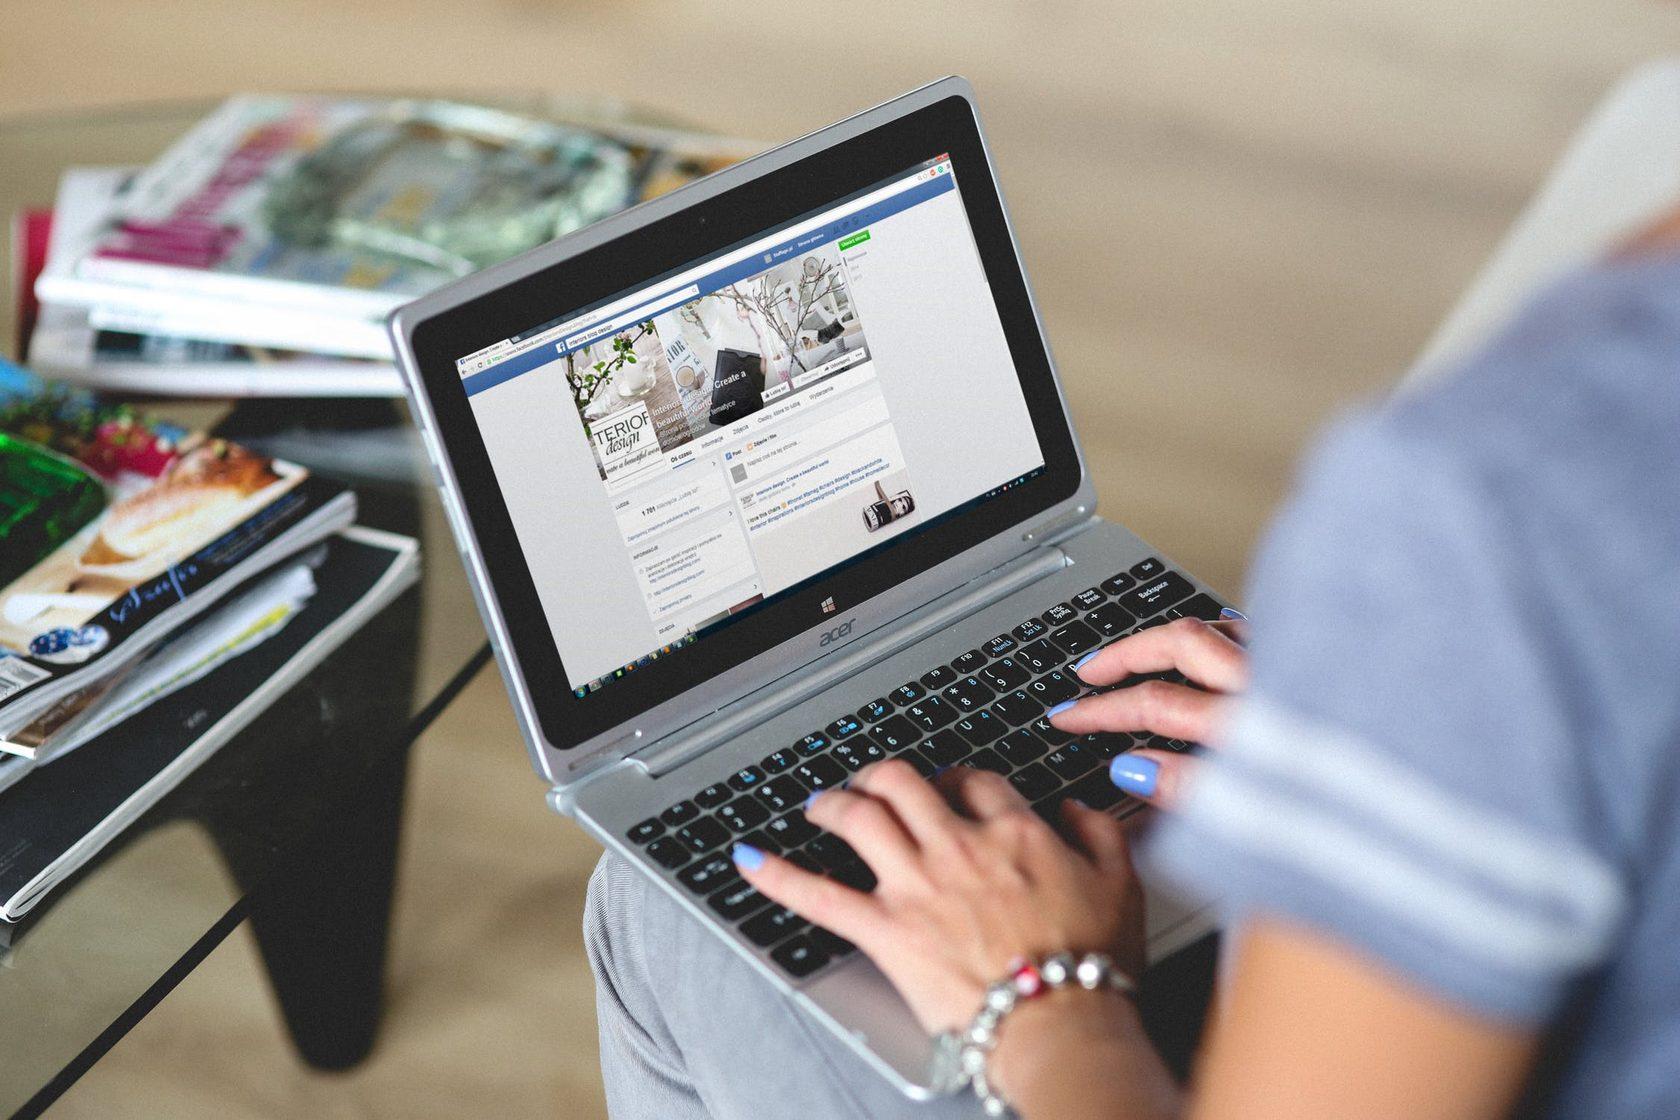 hands-woman-laptop-n